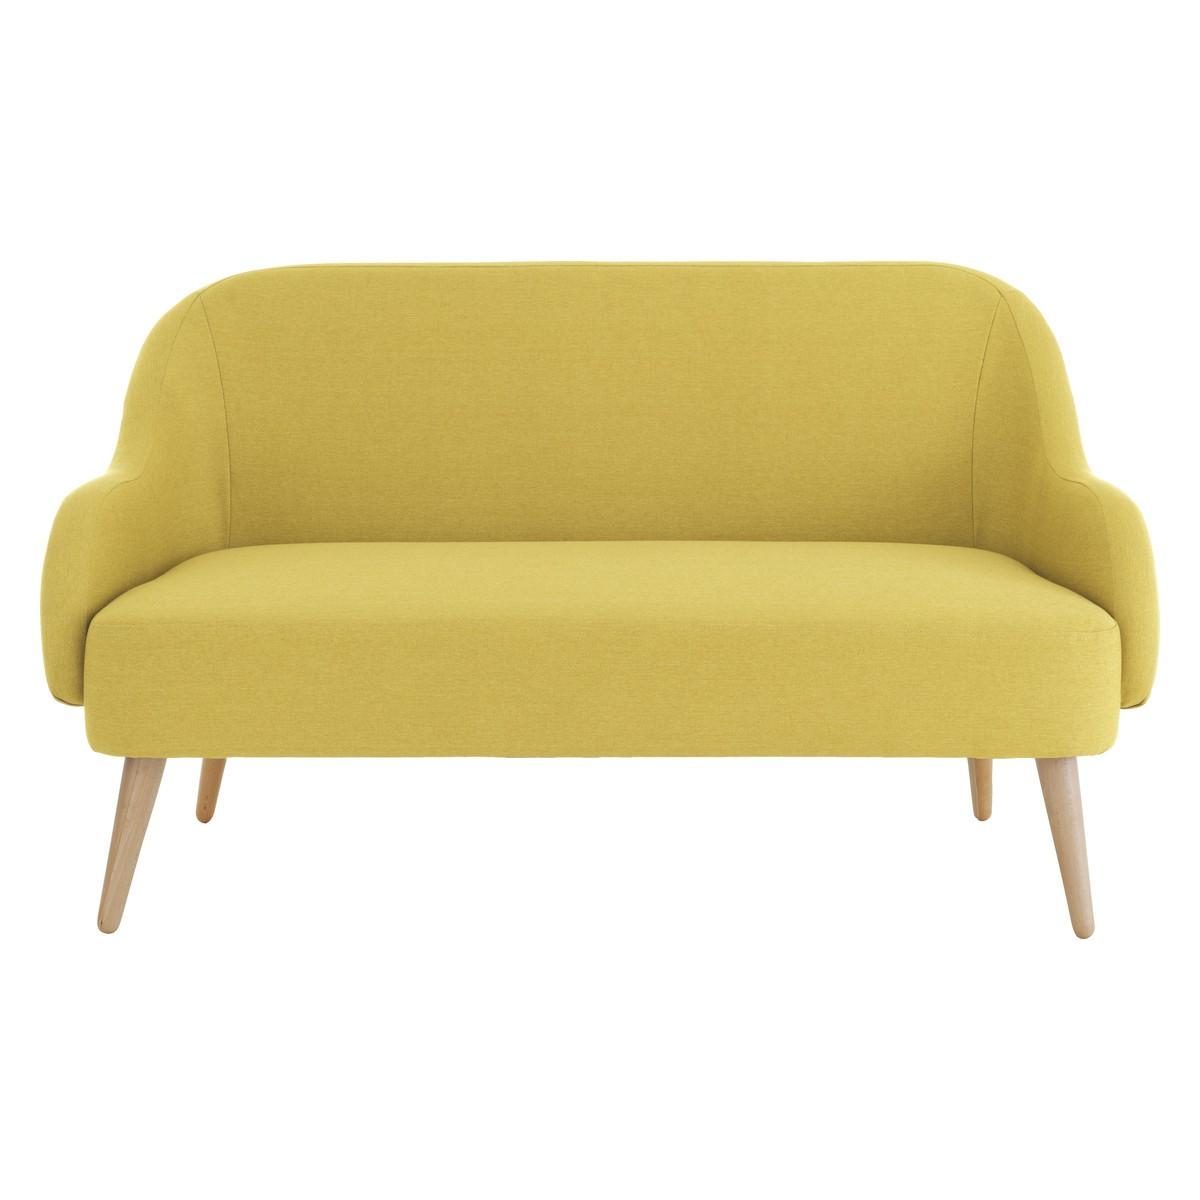 momo saffron yellow fabric 2 seater sofa IPBQNXB